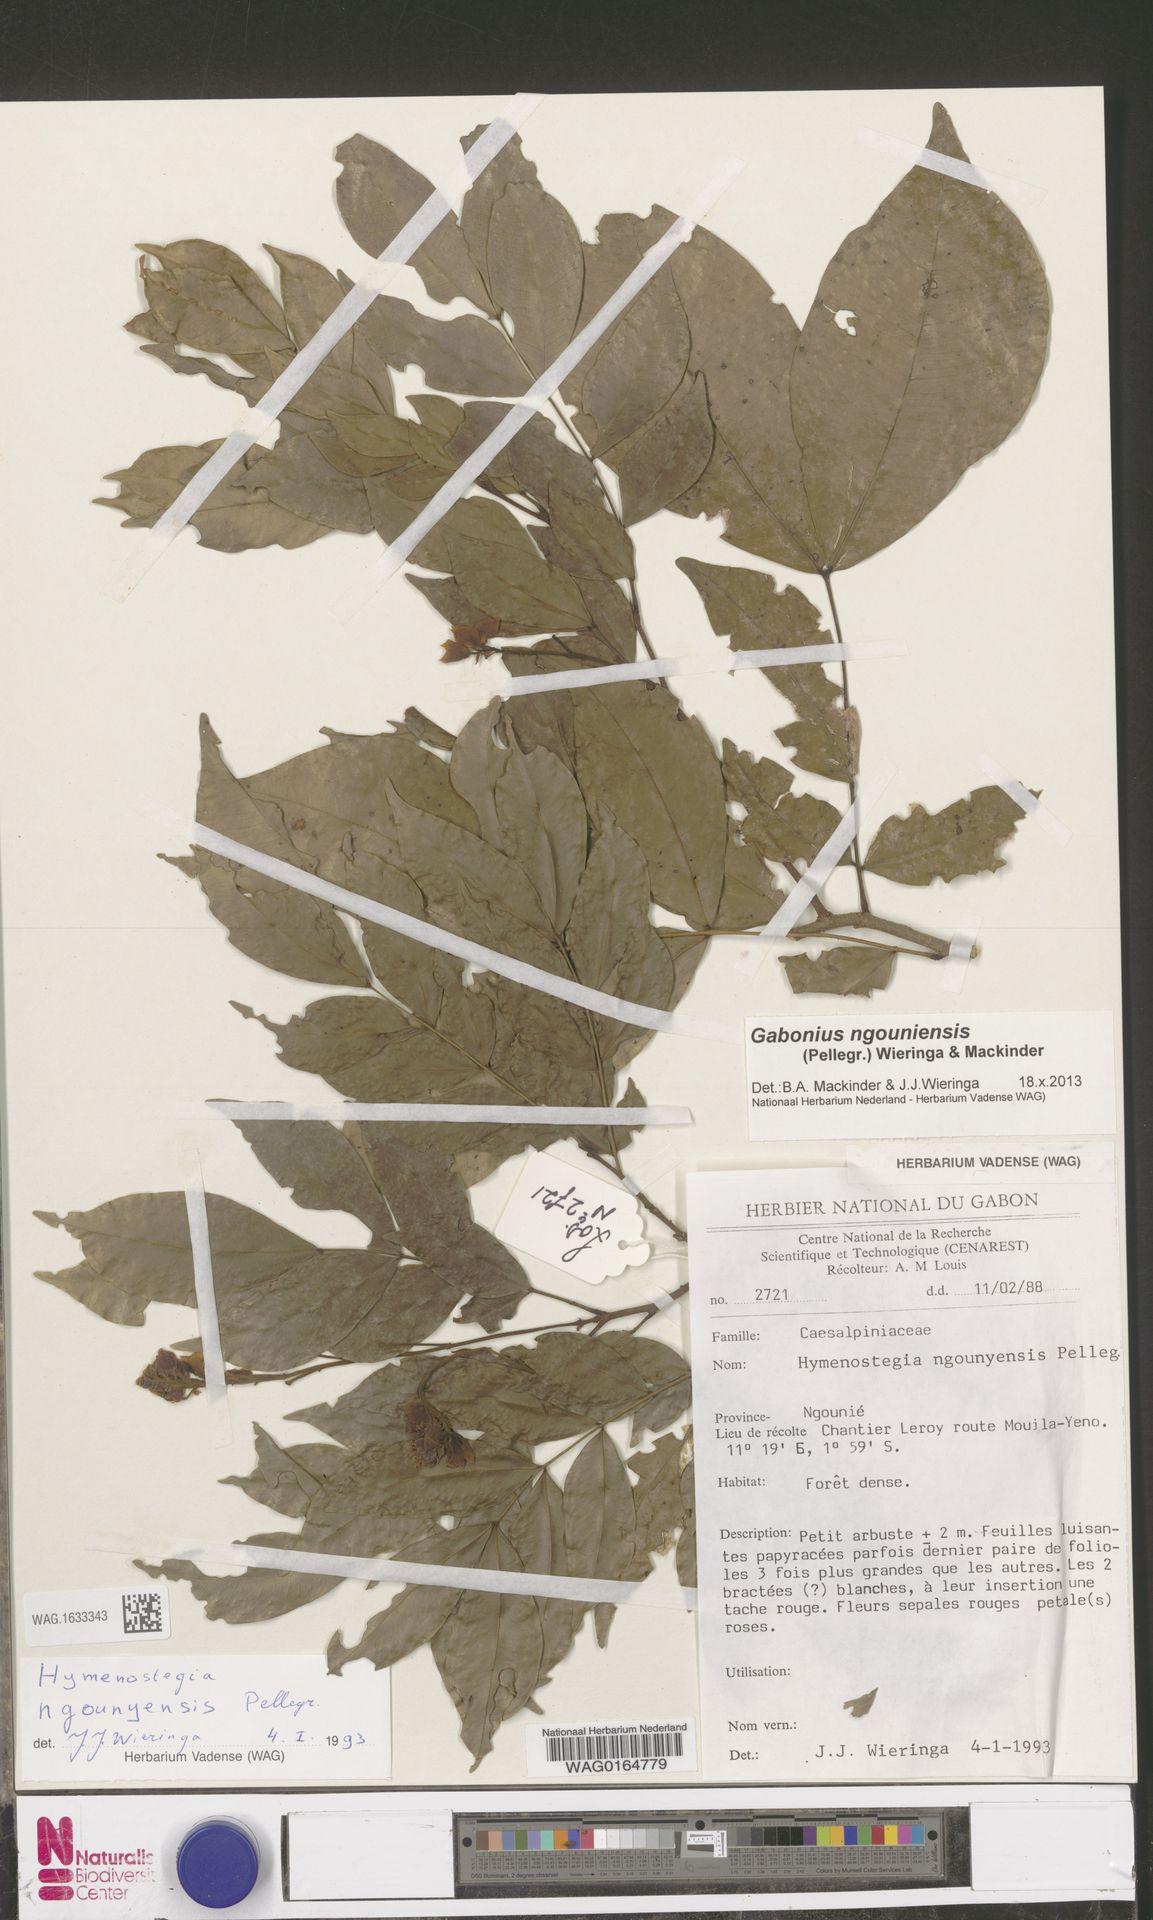 WAG.1633343 | Gabonius ngouniensis (Pellegr.) Wieringa & Mackinder